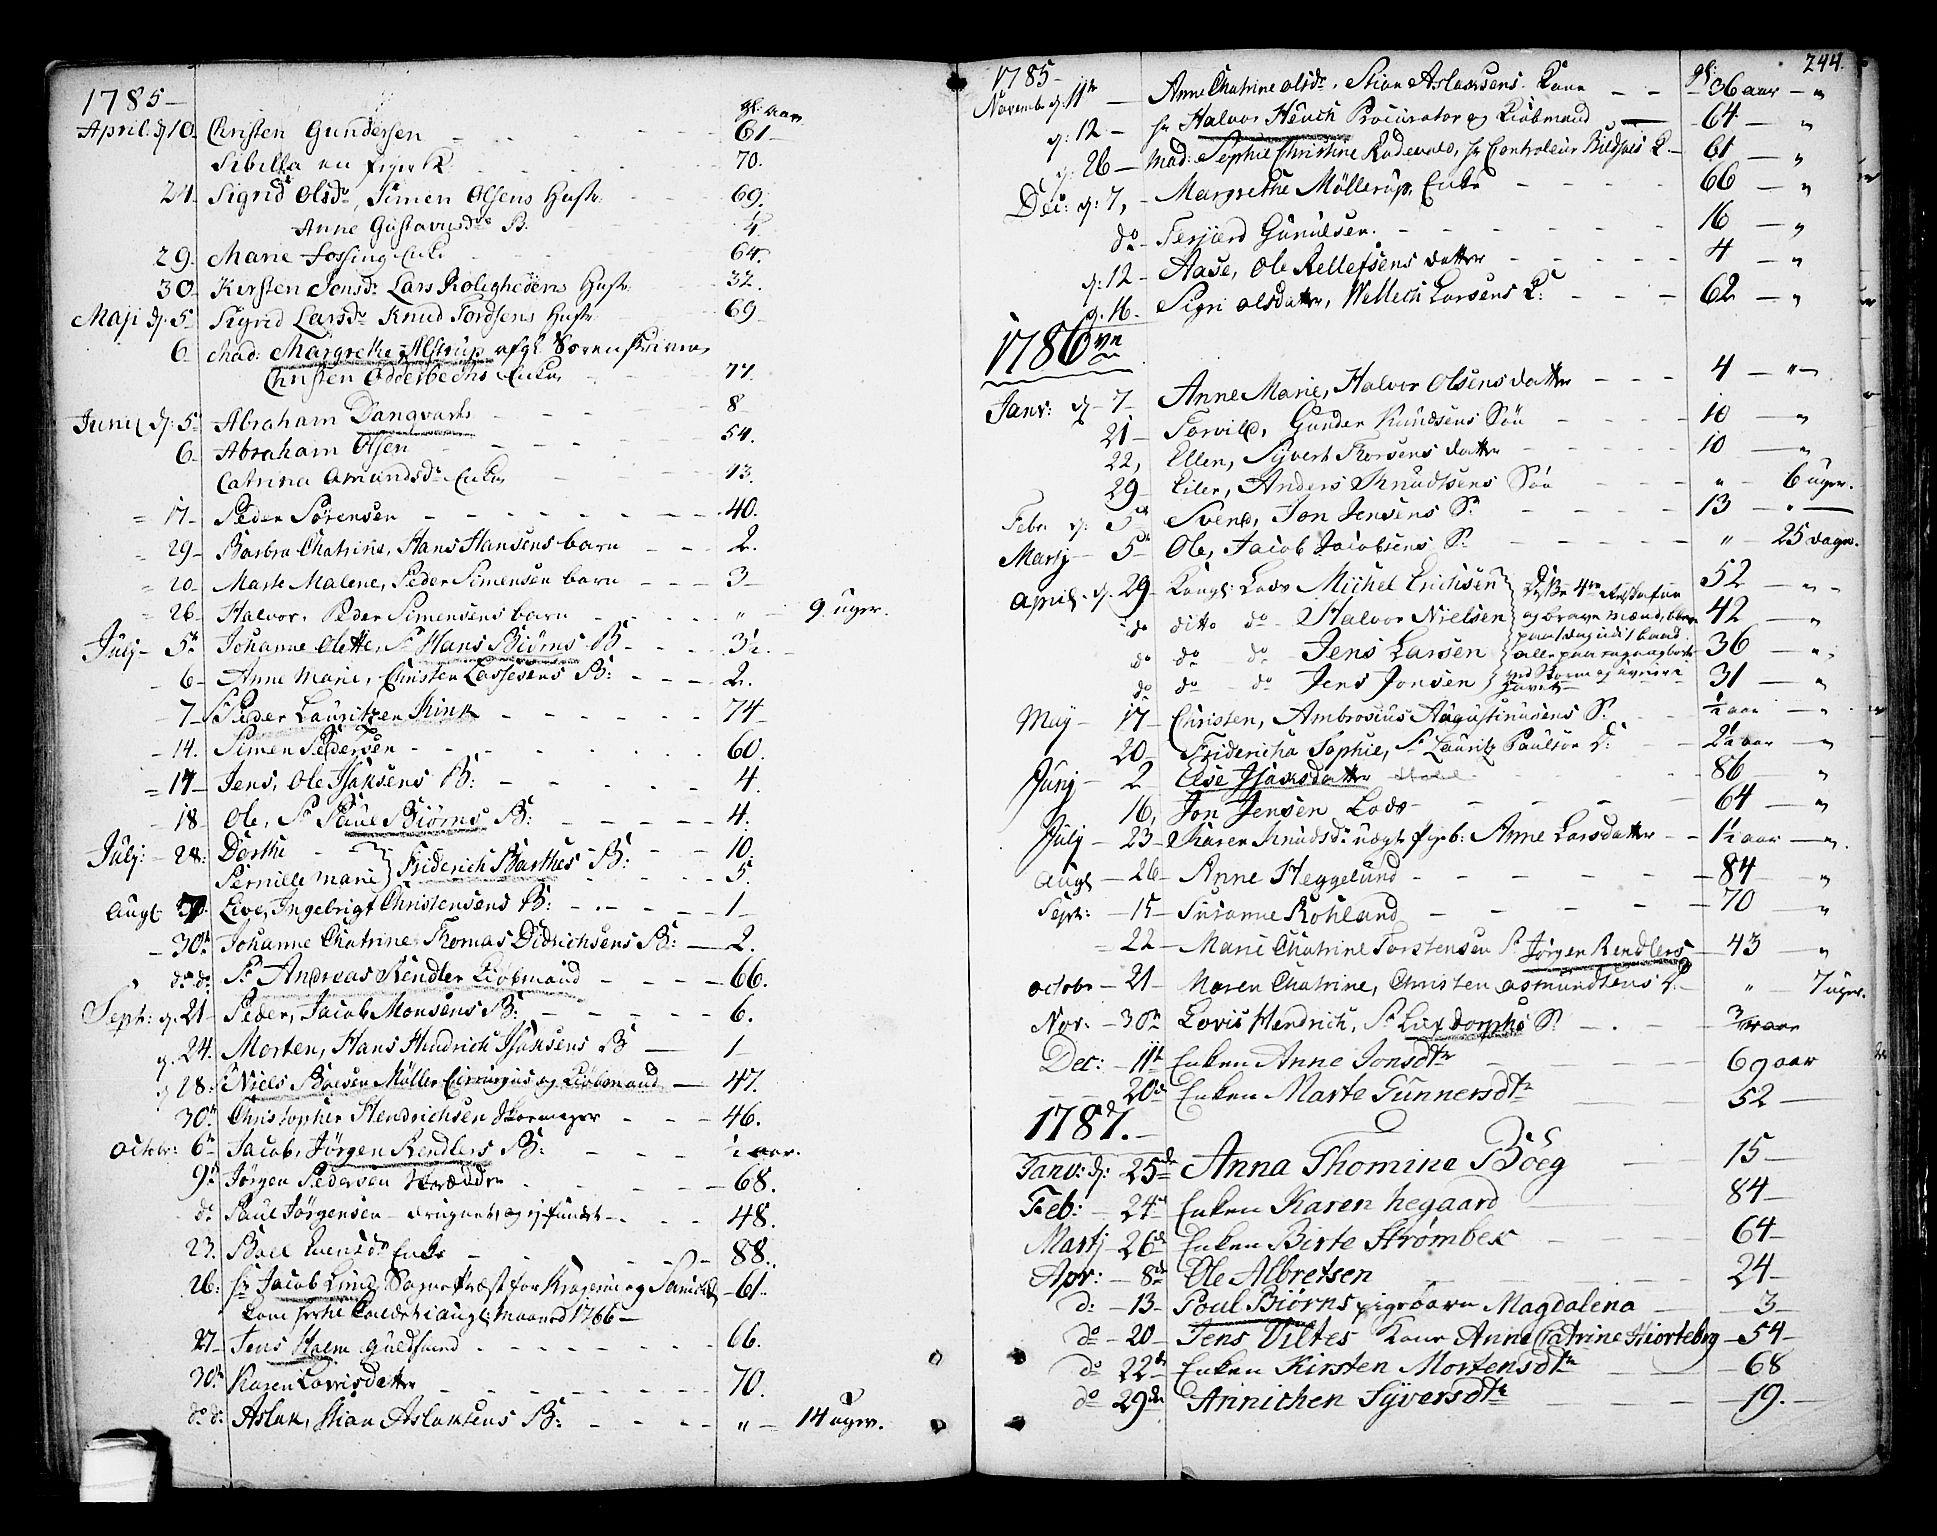 SAKO, Kragerø kirkebøker, F/Fa/L0002: Ministerialbok nr. 2, 1767-1802, s. 244